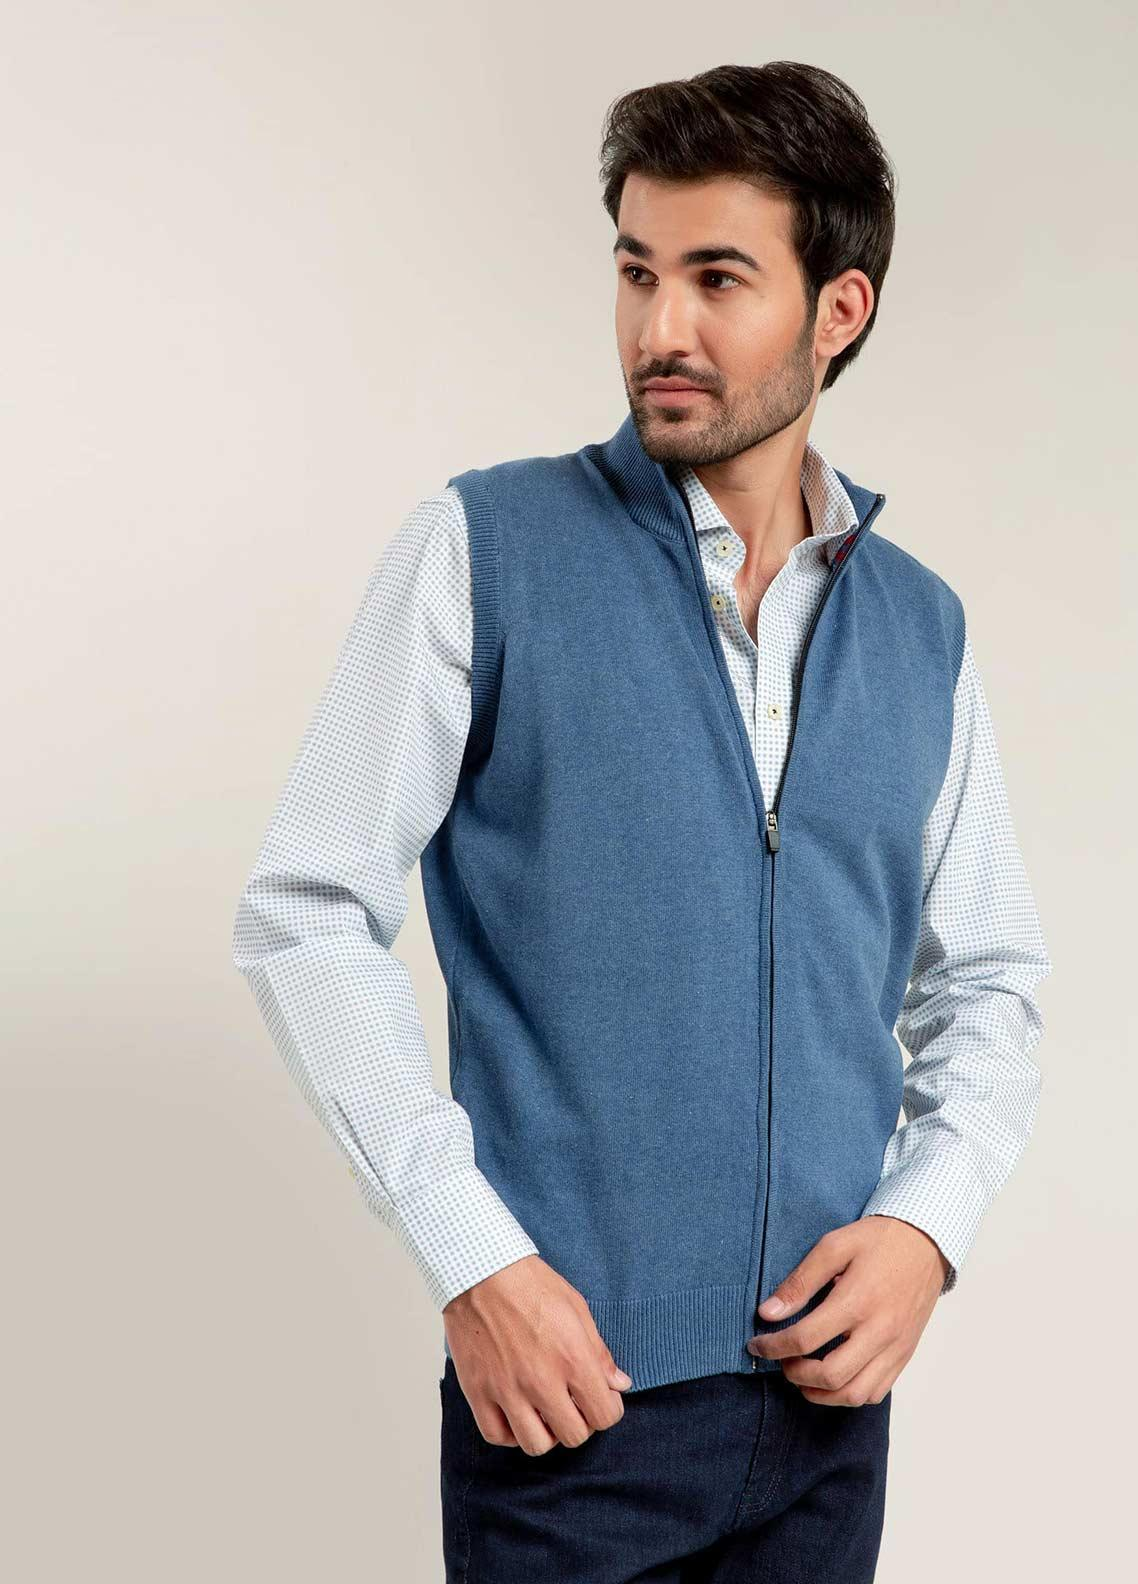 Brumano Cotton Sleeveless Zipper Sweaters for Men -  BM20WS Blue Light Sleeveless Zipper